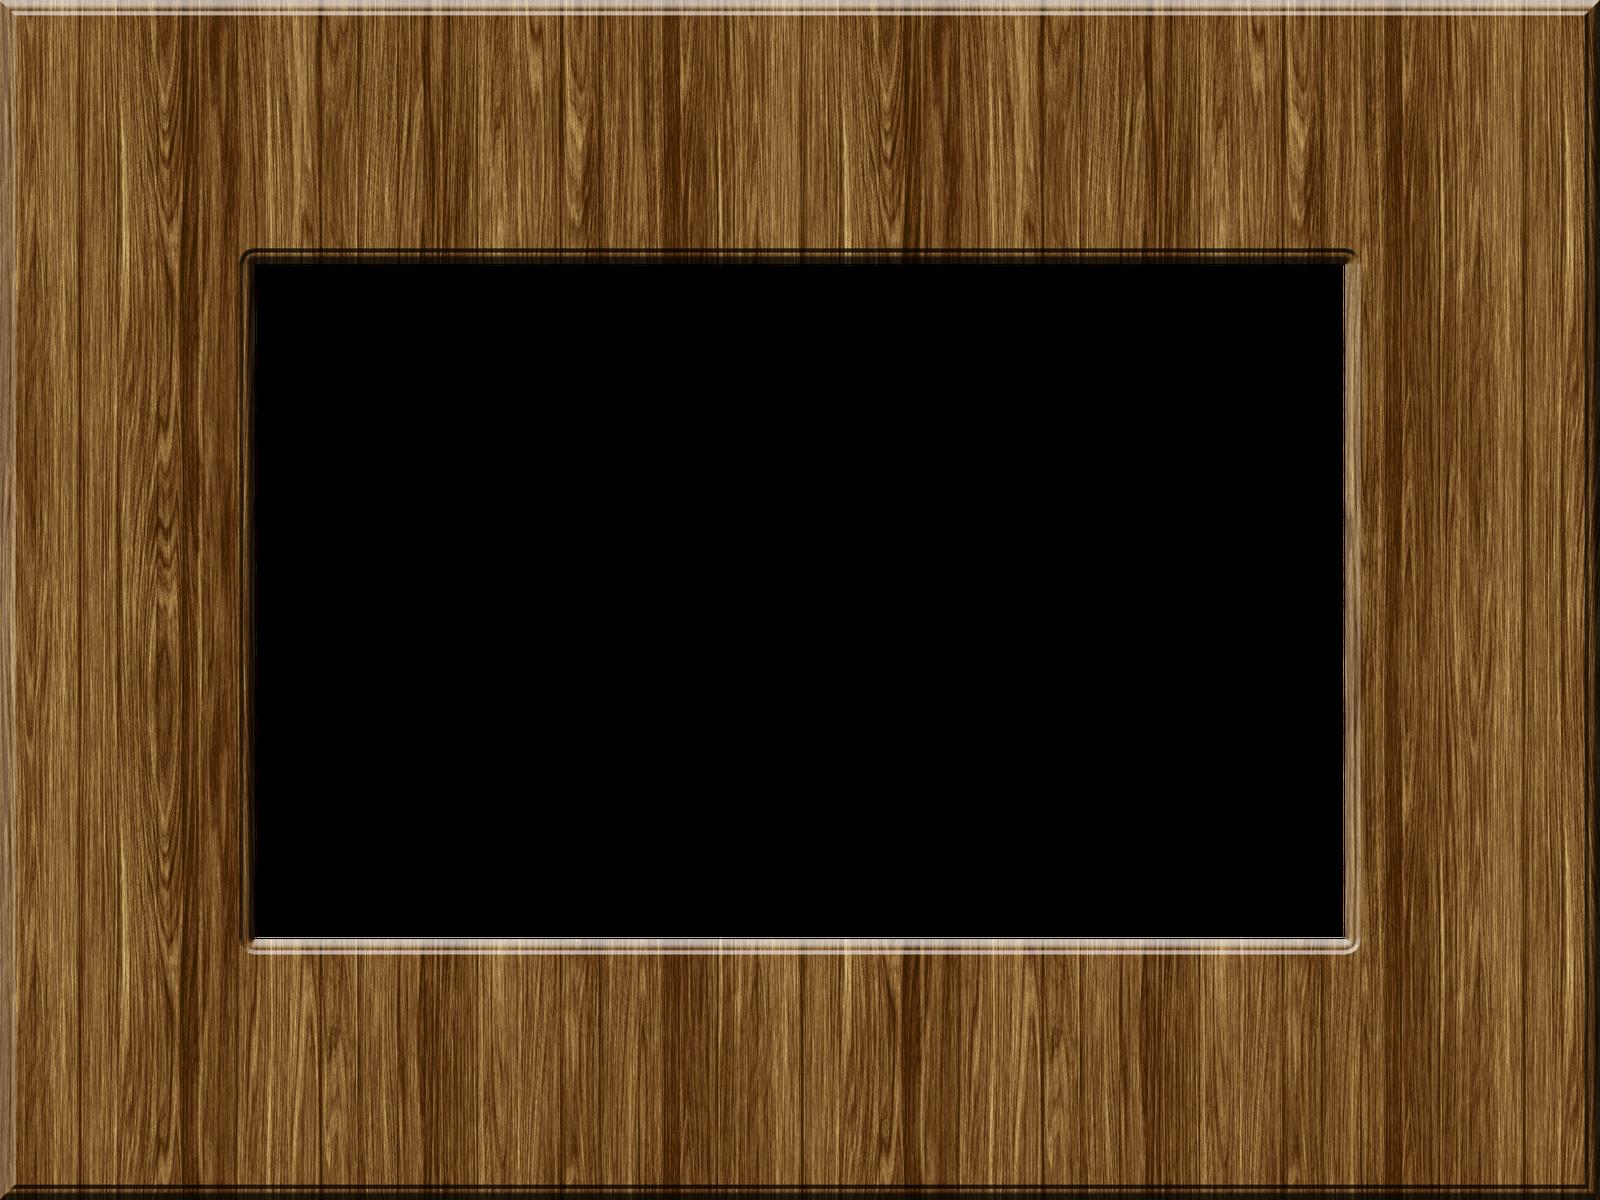 Photoshoplove marcos de madera - Marcos de madera ...